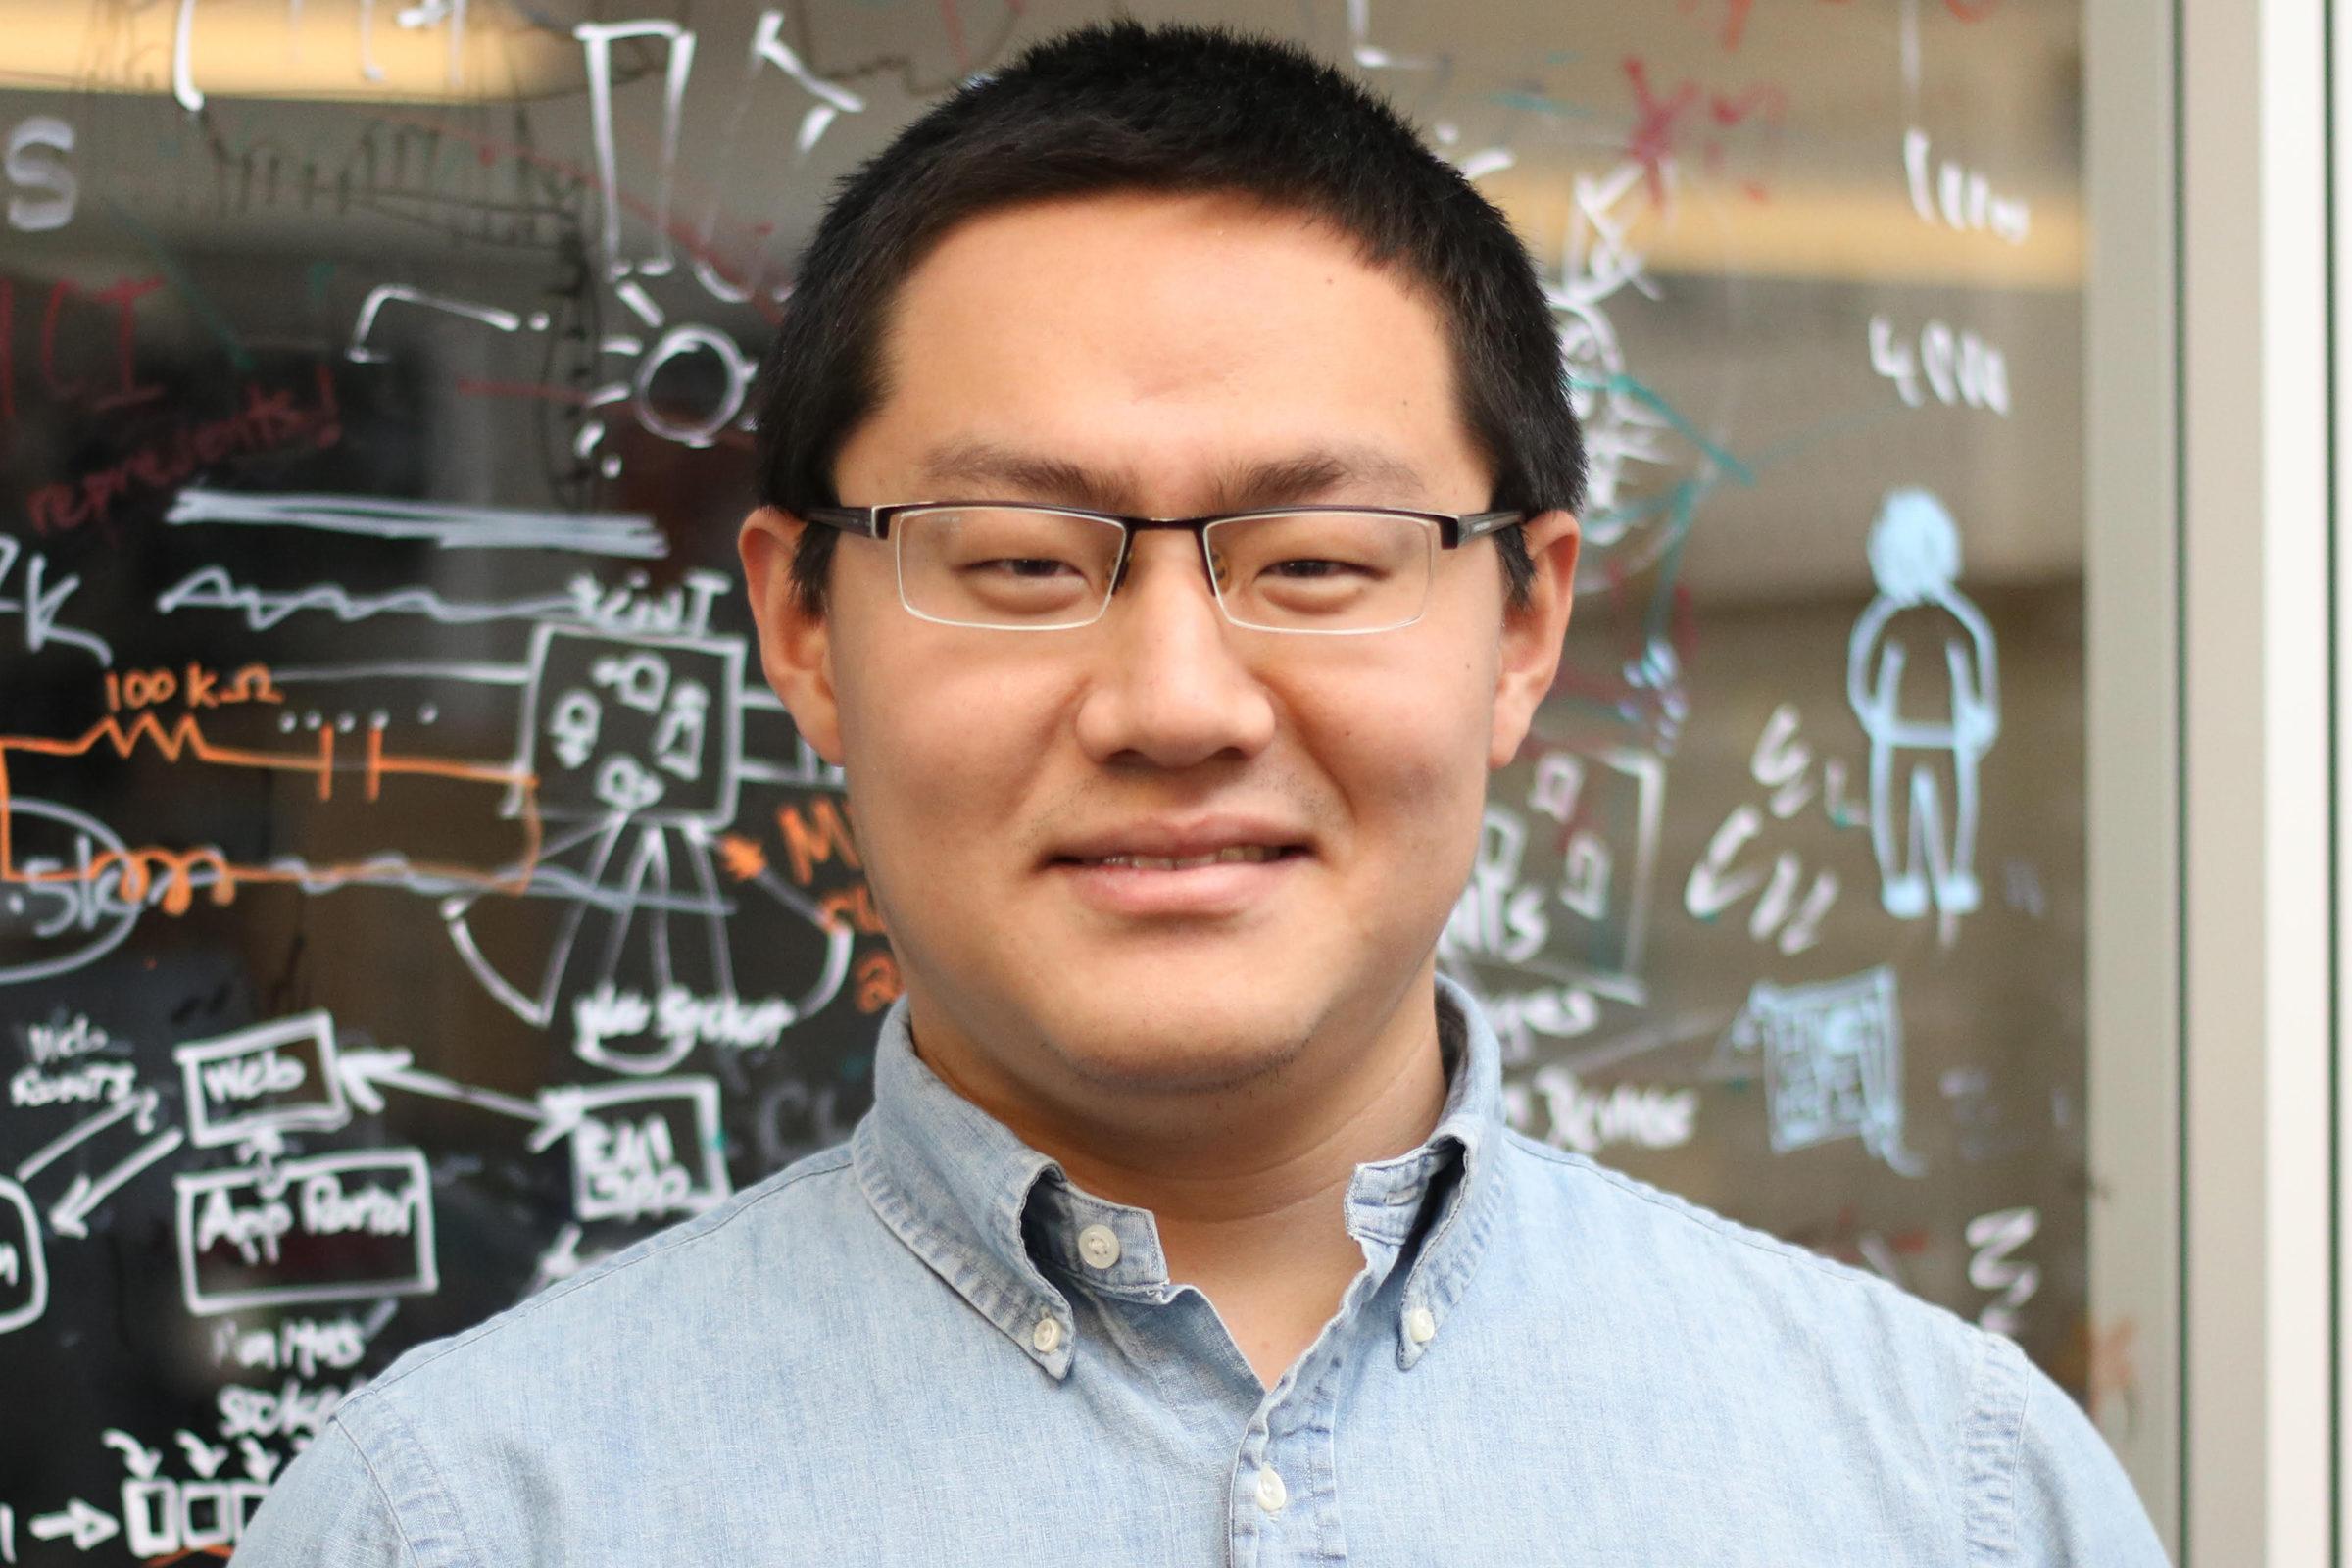 Anhong Guo